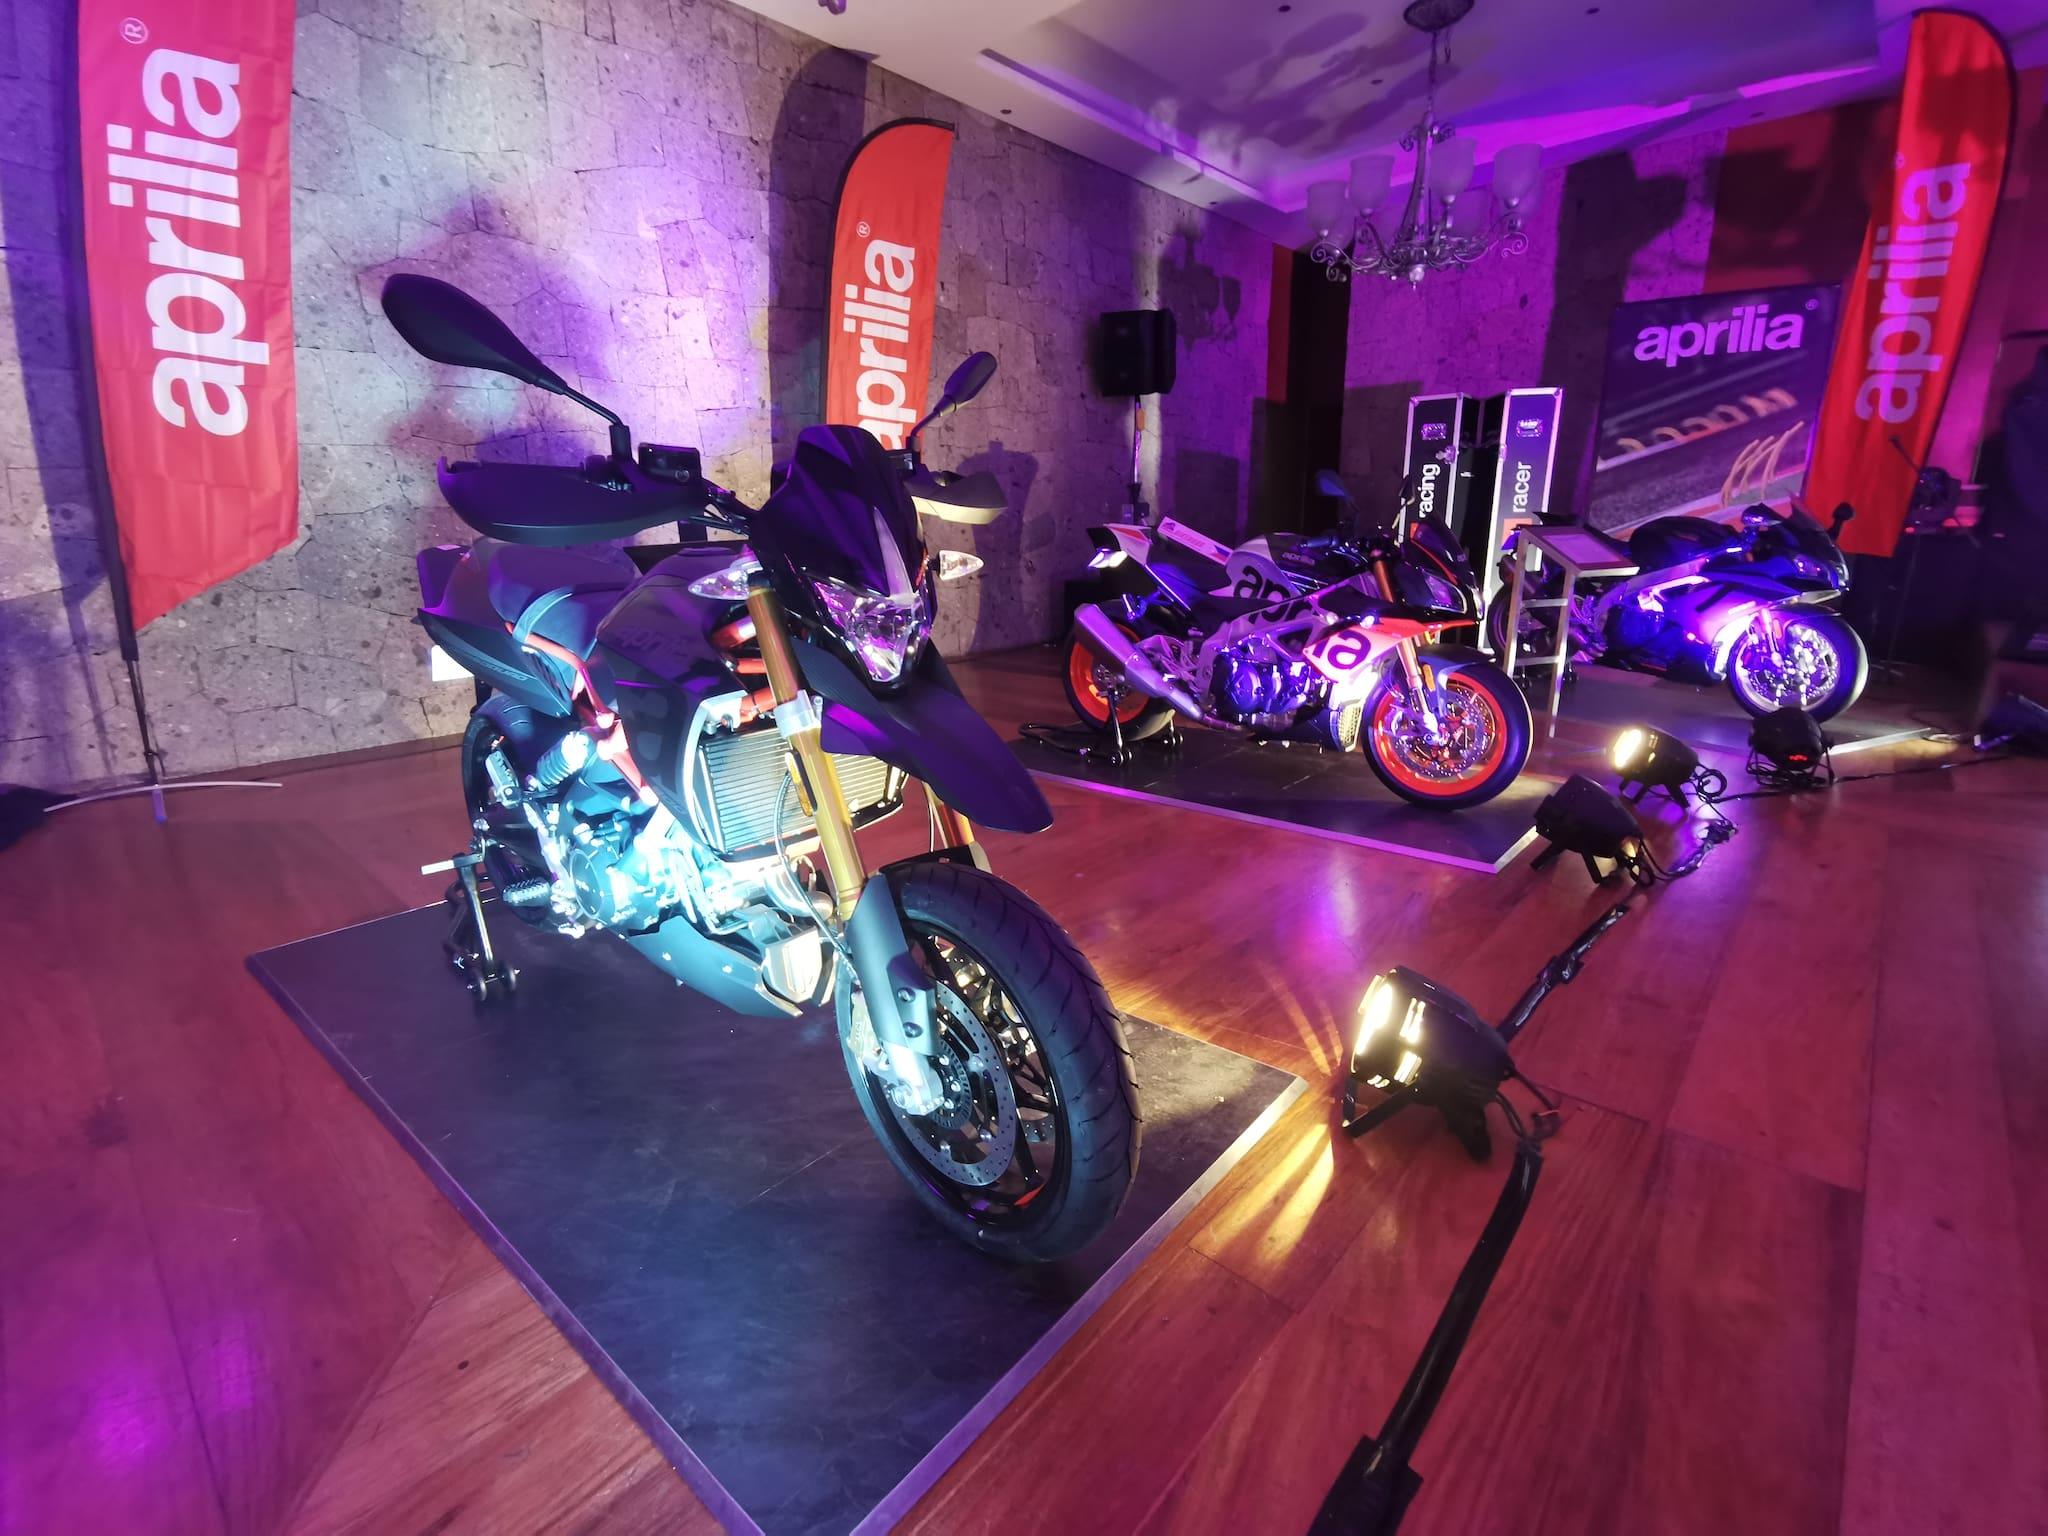 Bikerbox Brings Back Aprilia, Tags Along Moto Guzzi